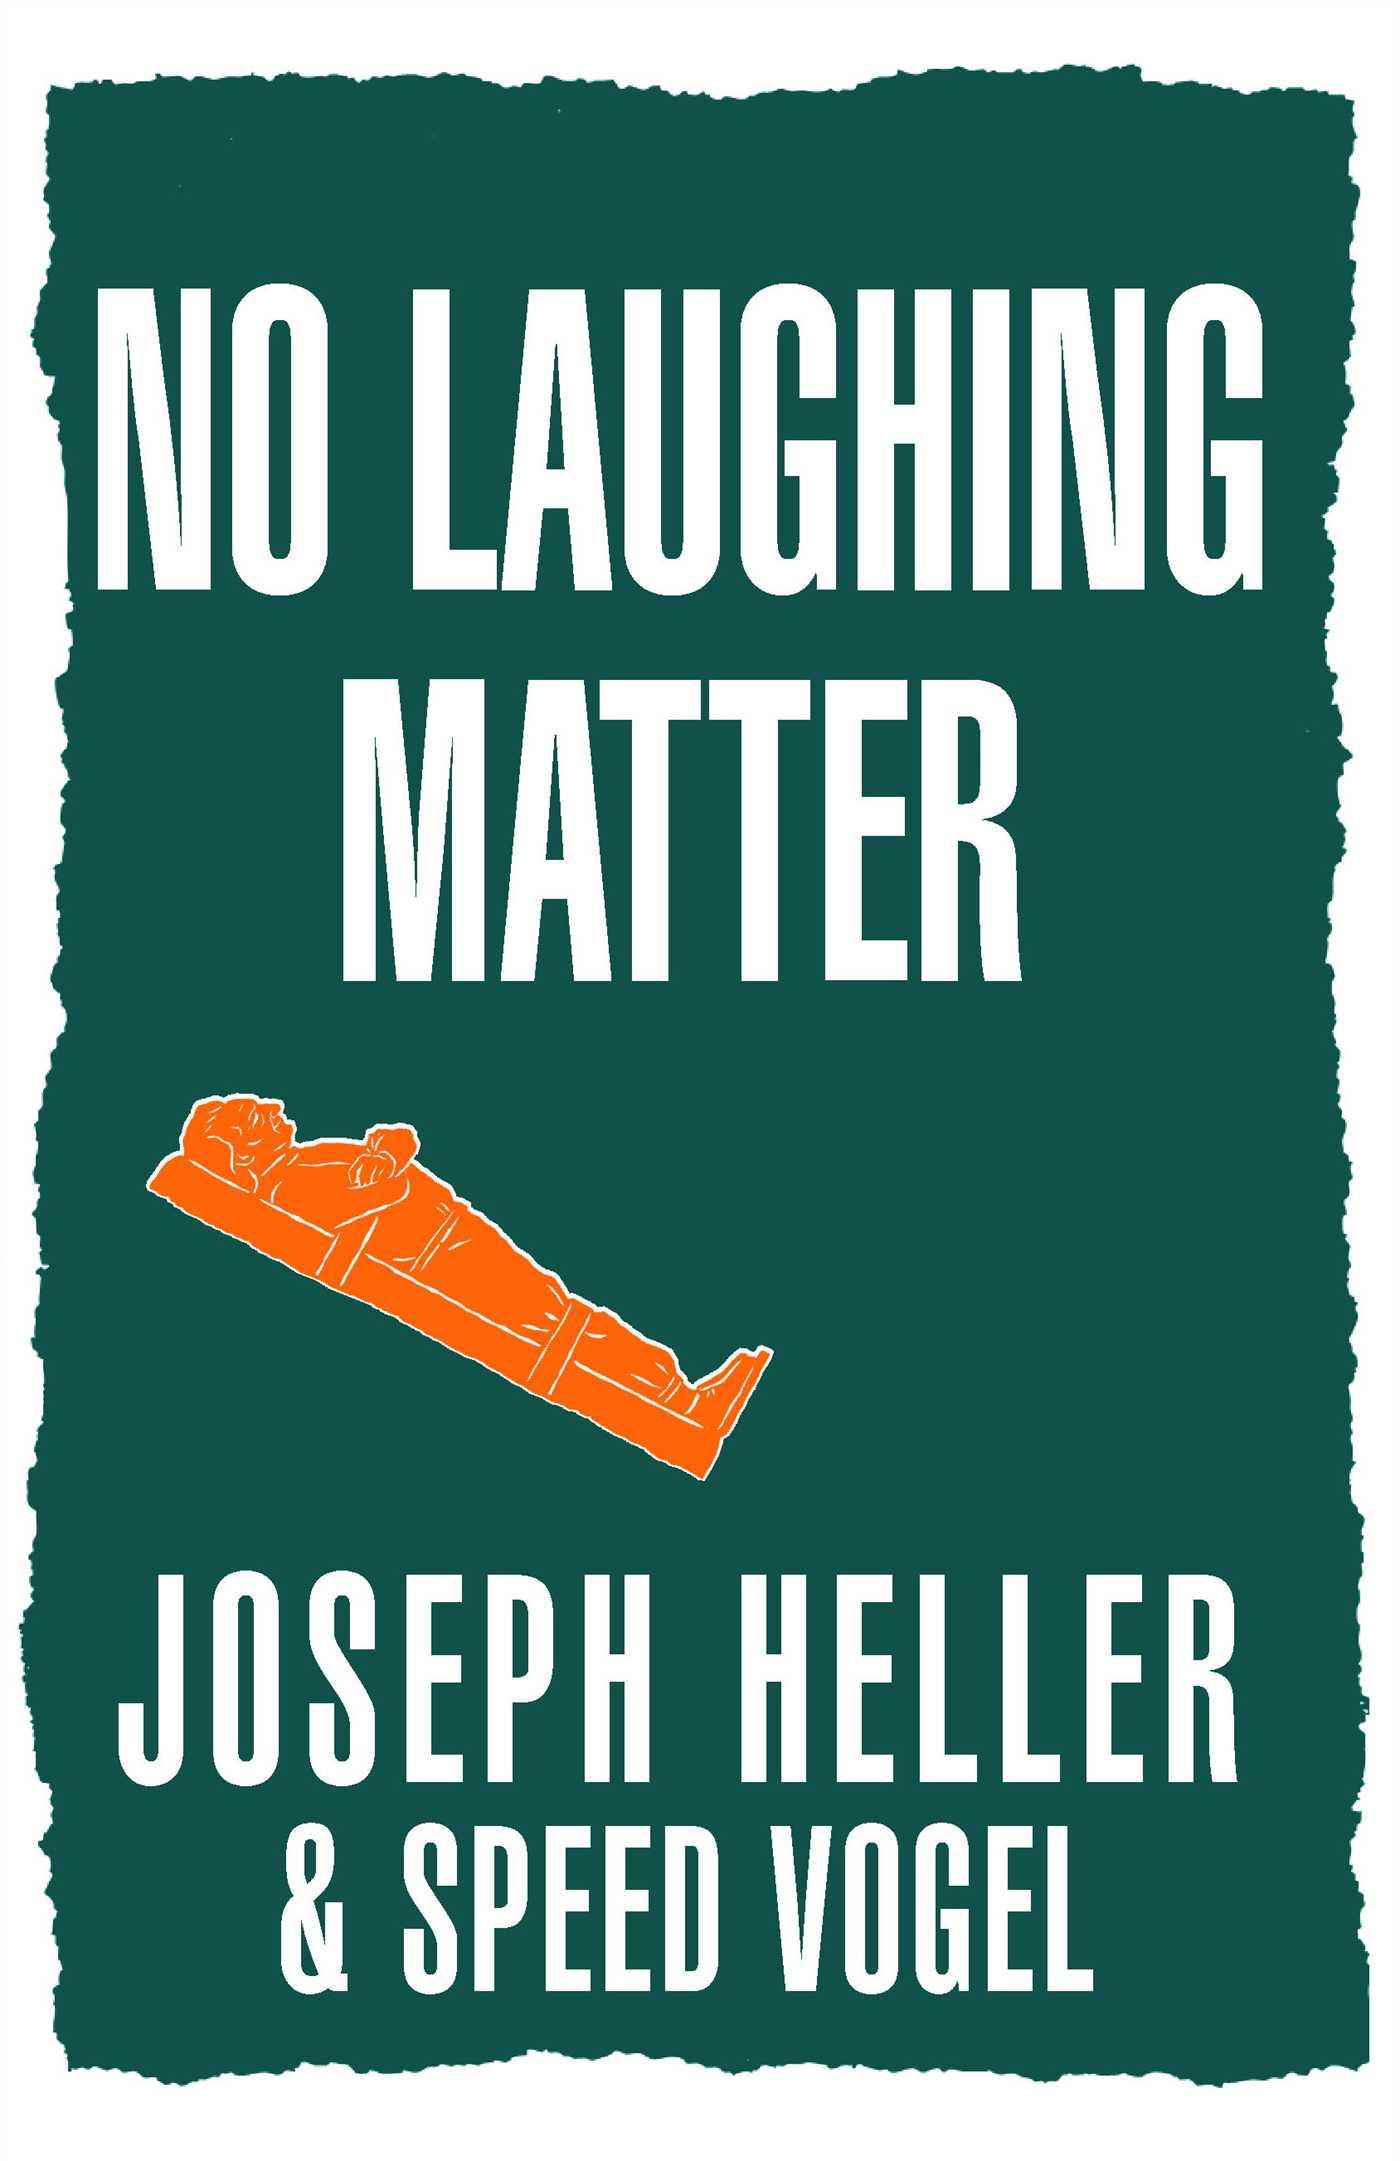 No laughing matter book by joseph heller speed vogel official cvr9780743247177 9780743247177 hr no laughing matter fandeluxe Gallery